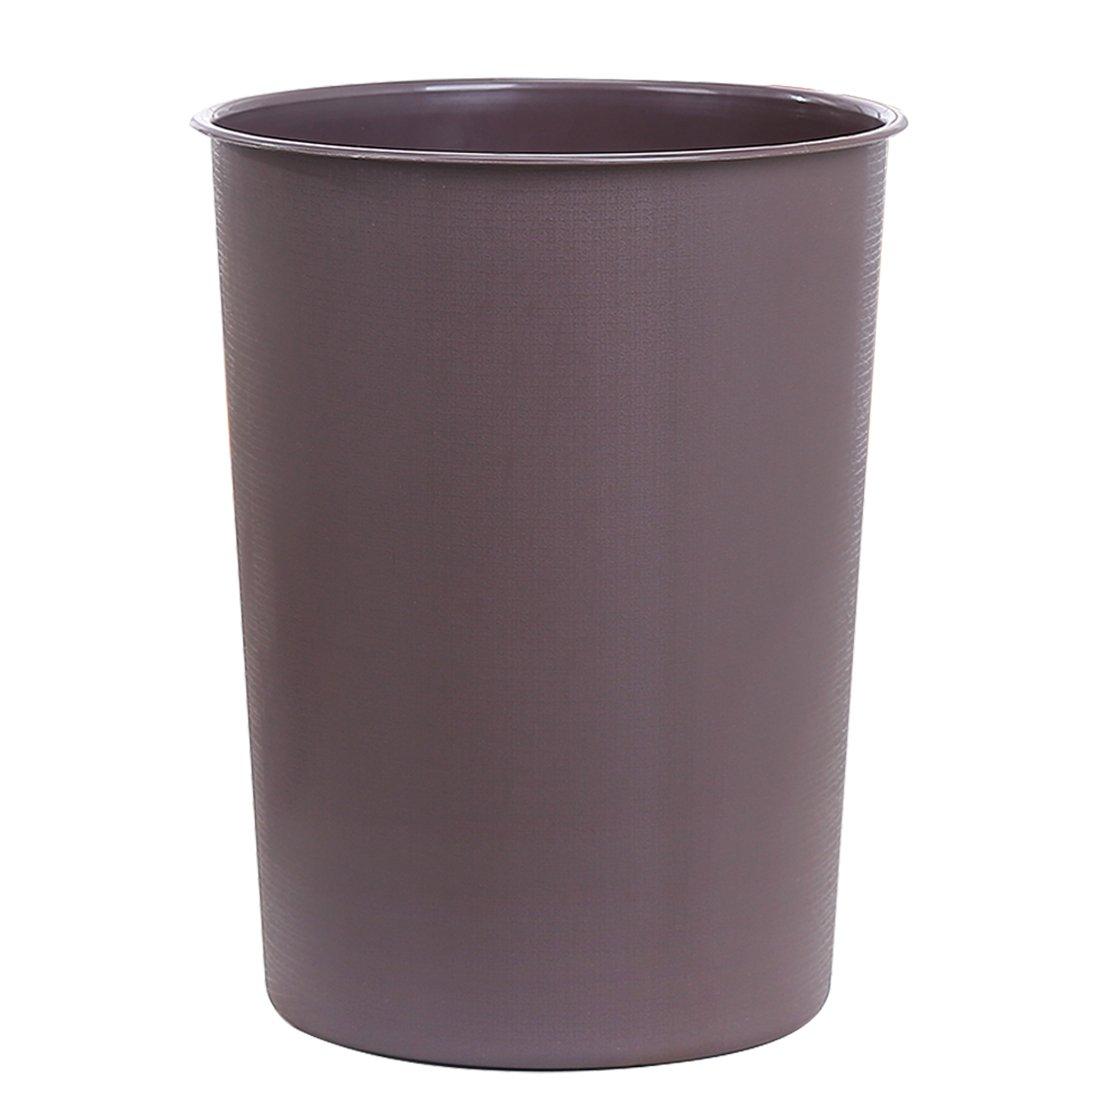 LoKauf Waste Paper Bin Waste Paper Basket Household Plastic Round Lidless Trash Can Garbage Bin